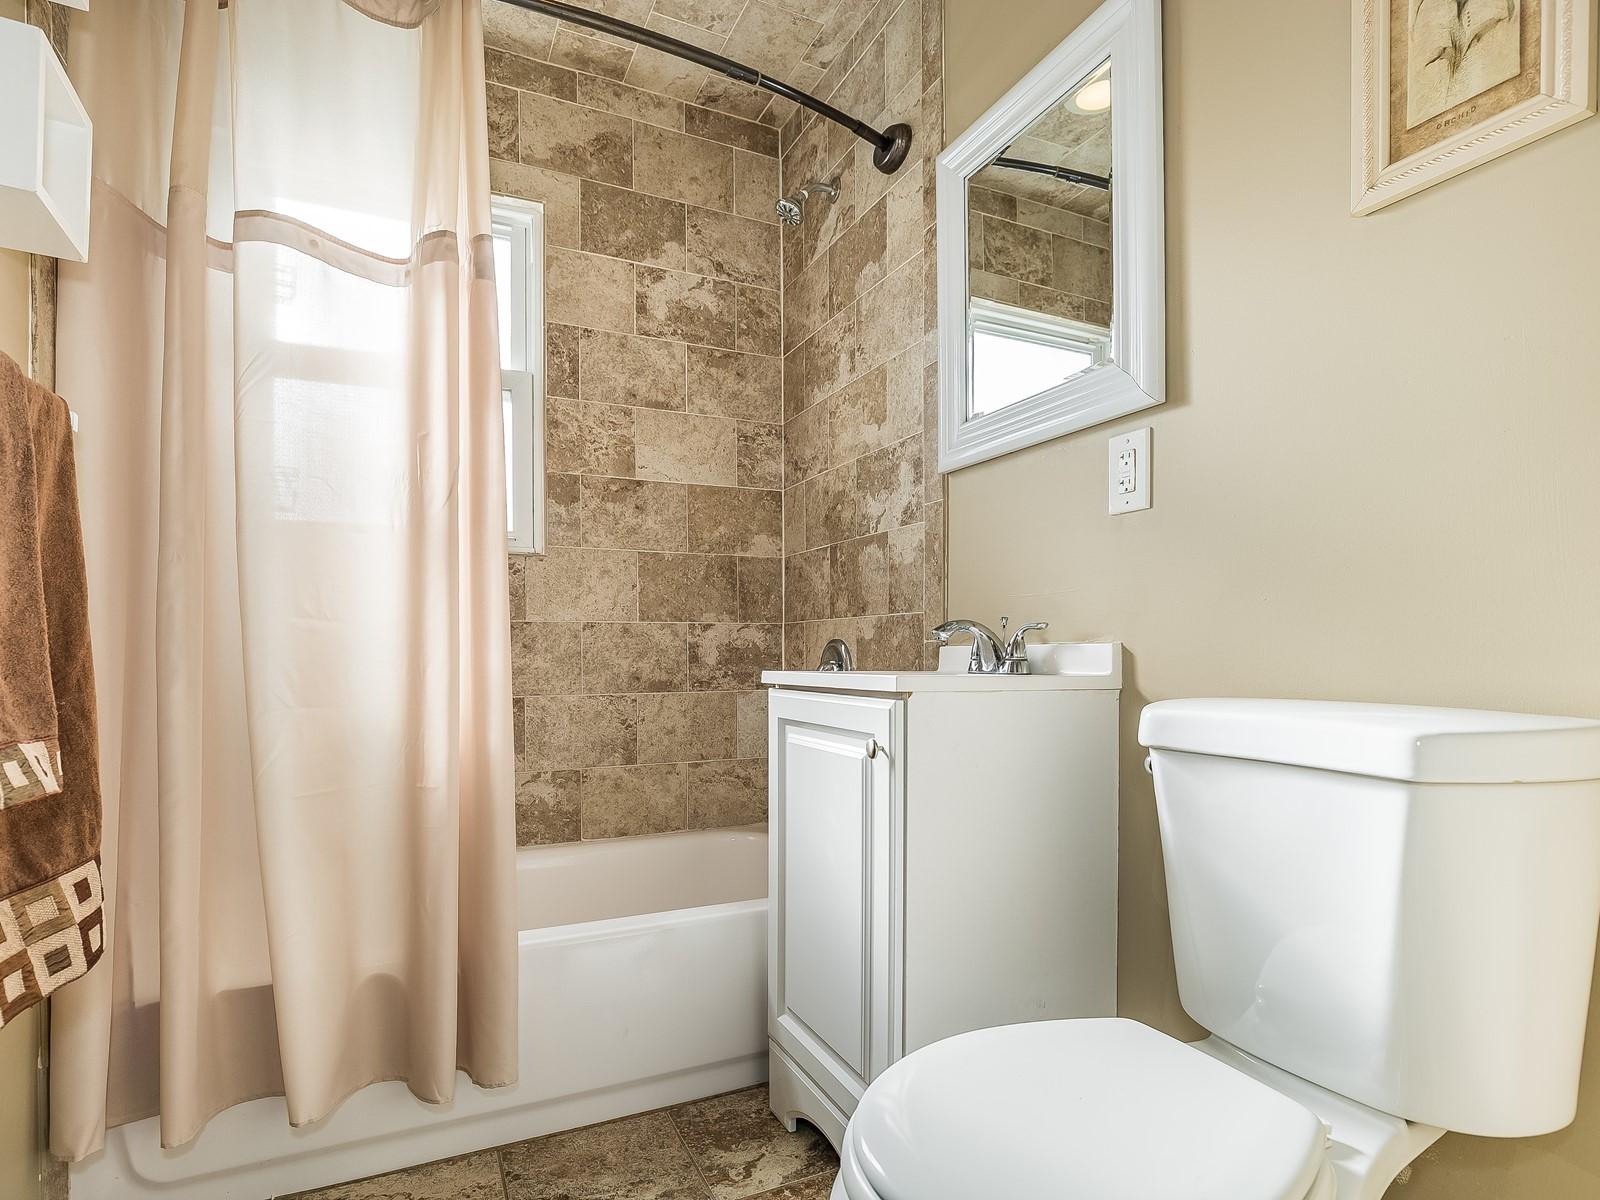 08-Furnished_Apartment_Edison_Bathroom